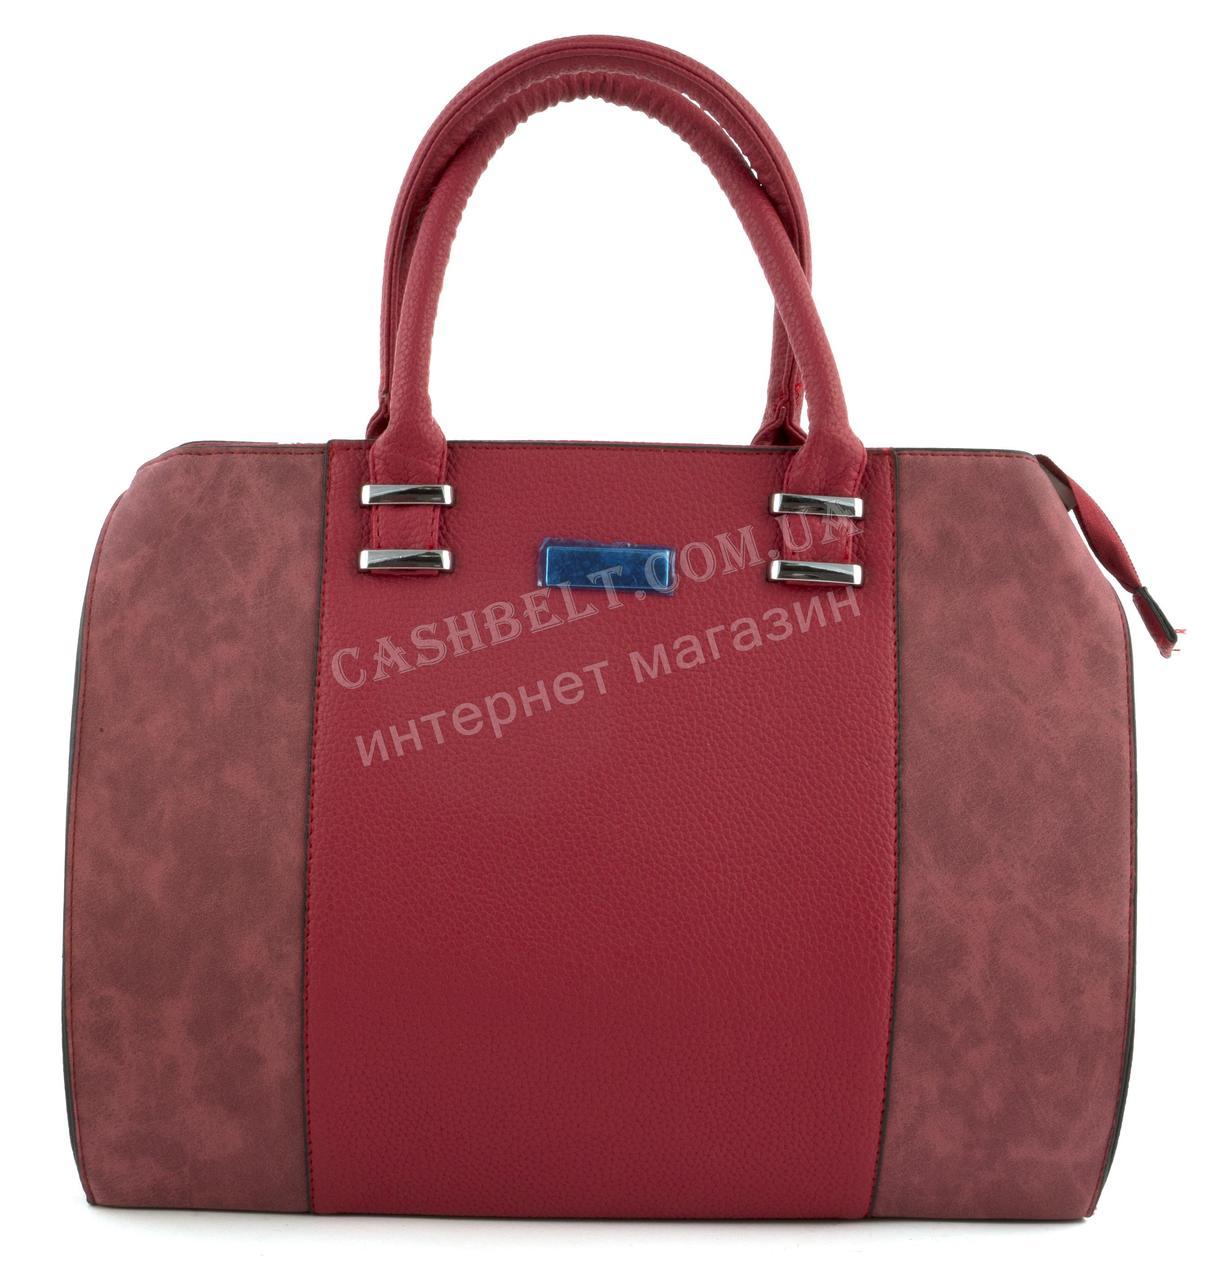 a995e741a49e Большая каркасная стильная прочная женская сумка art. 040 красная ...